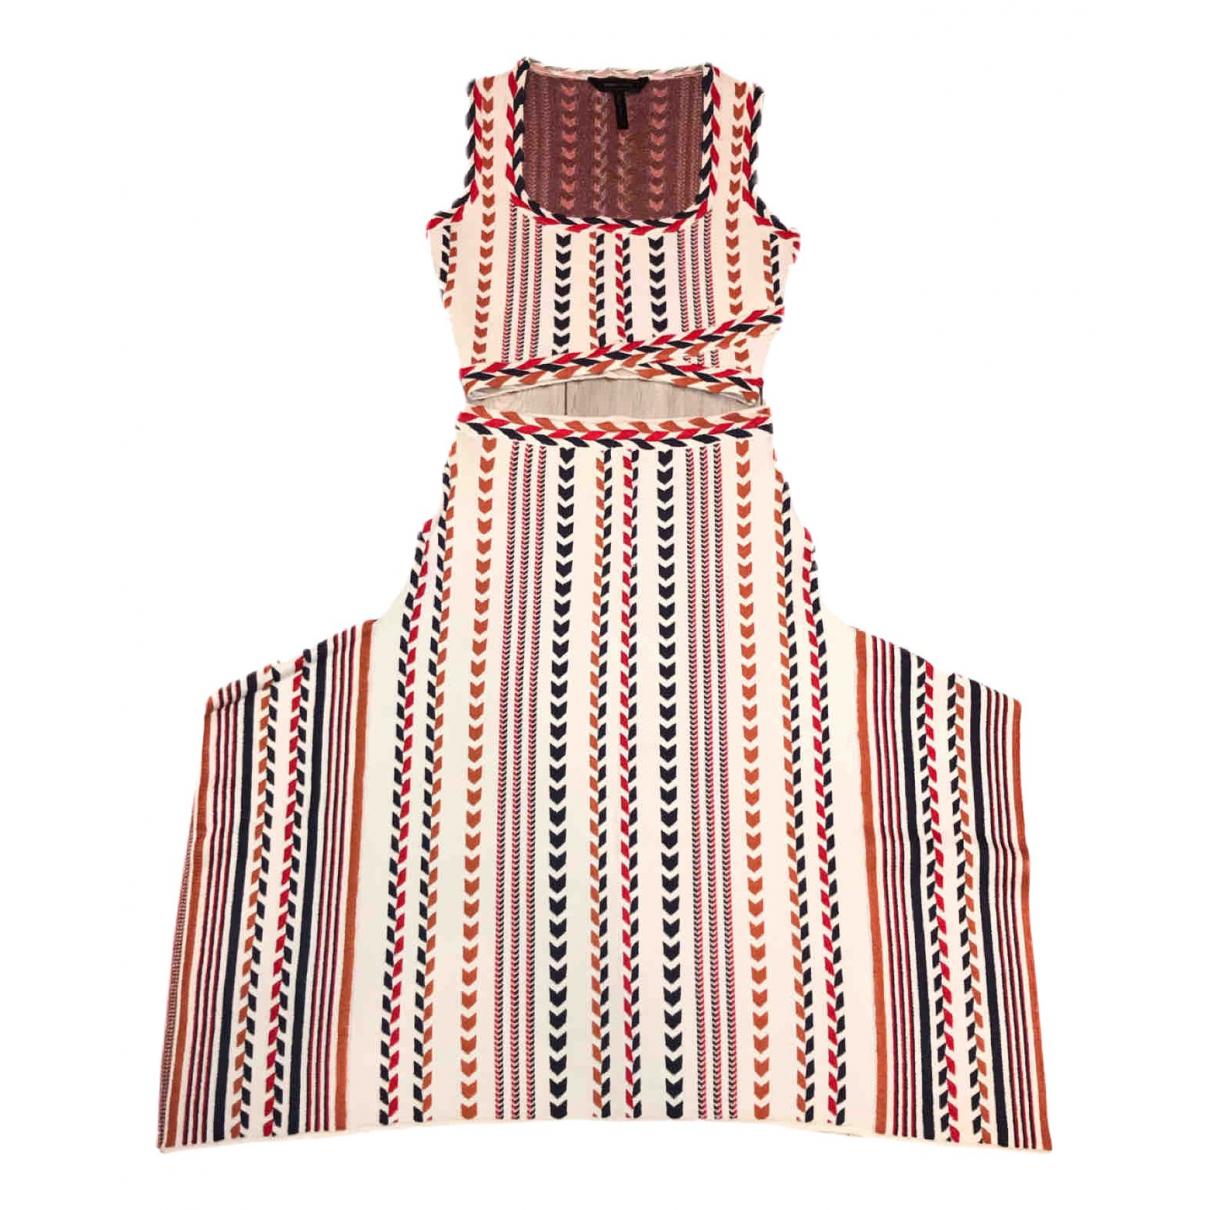 Bcbg Max Azria N Multicolour Knitwear for Women 34 FR